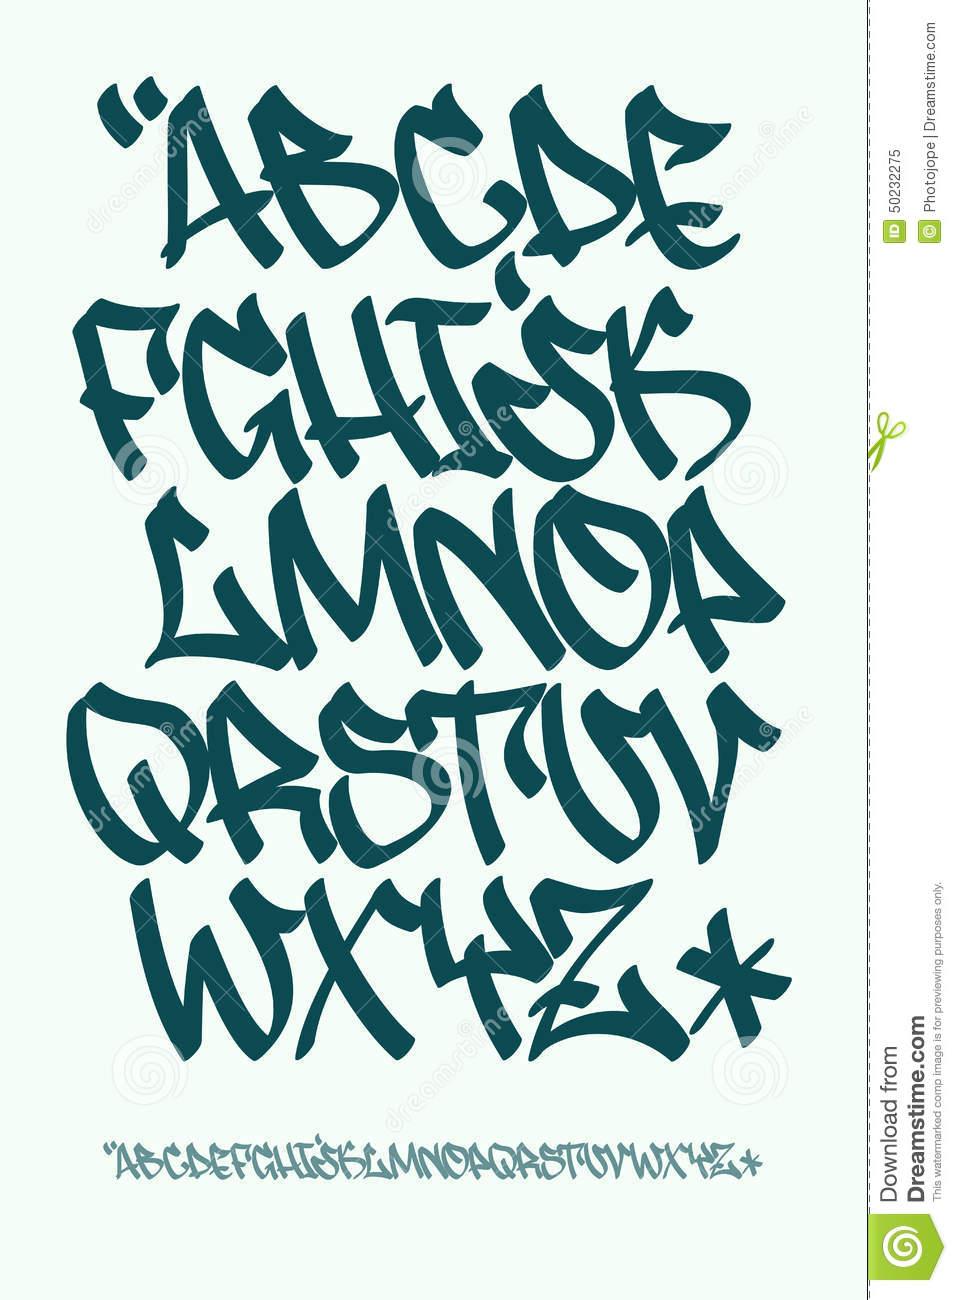 Graffiti Alphabet Capital Letters